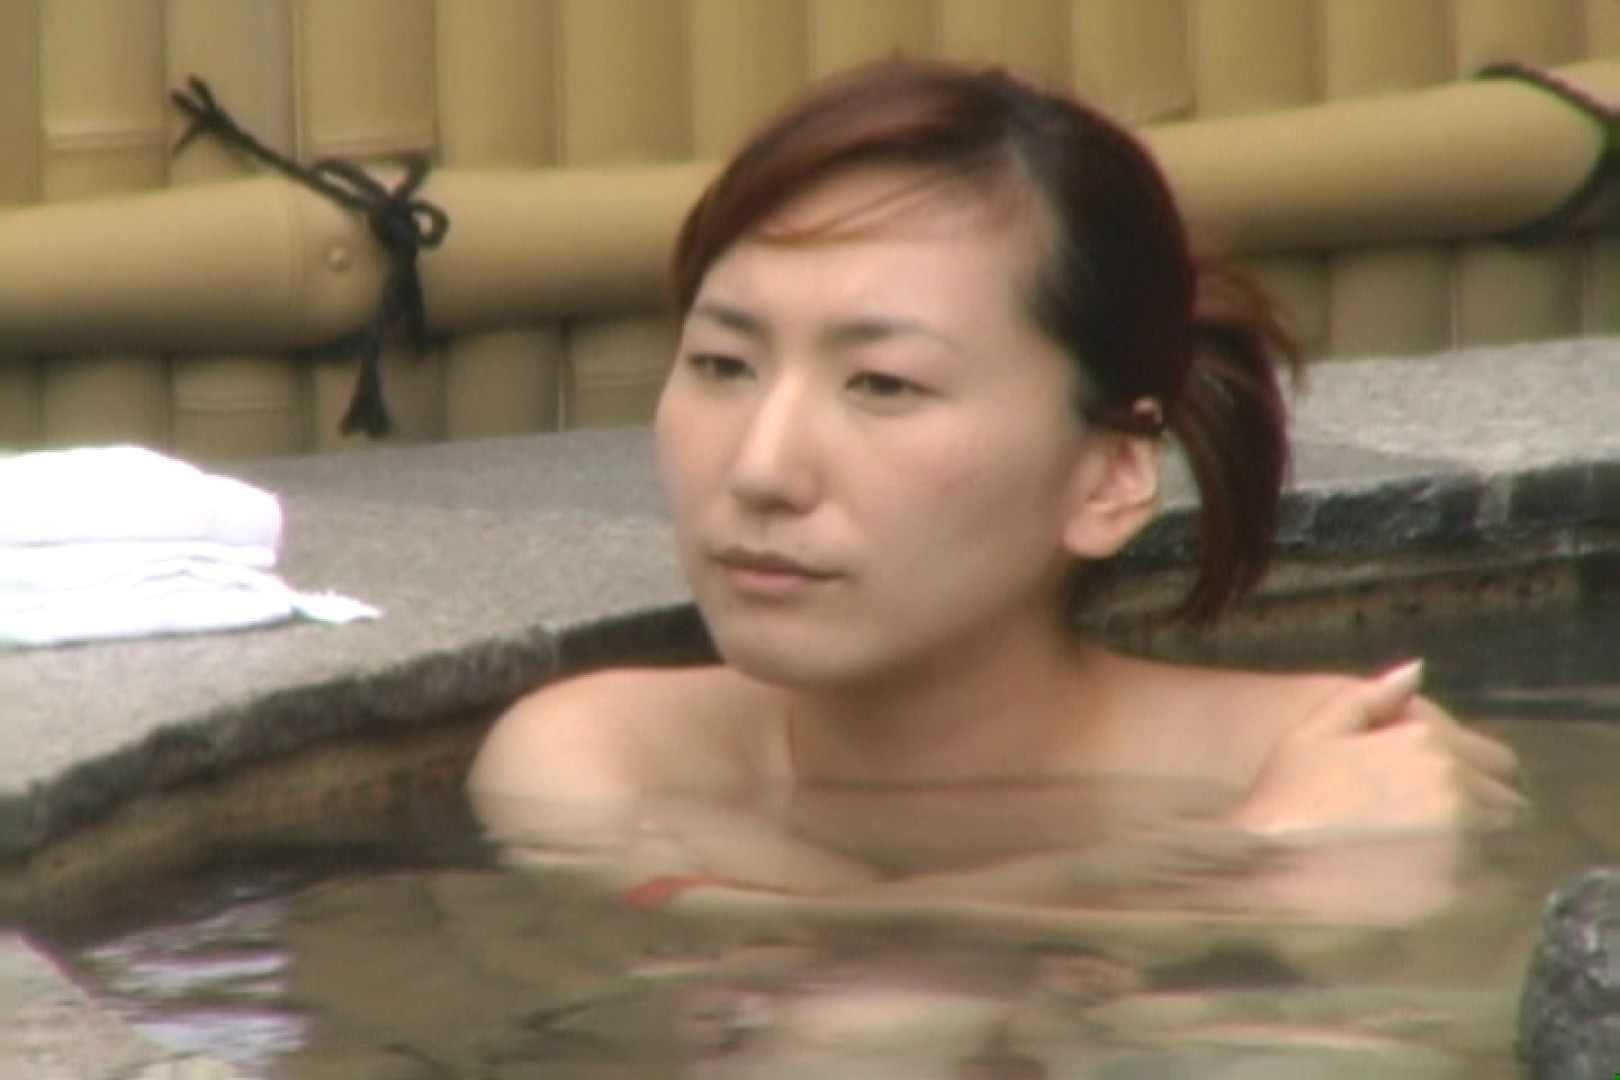 Aquaな露天風呂Vol.616 露天風呂編   盗撮シリーズ  89PIX 59